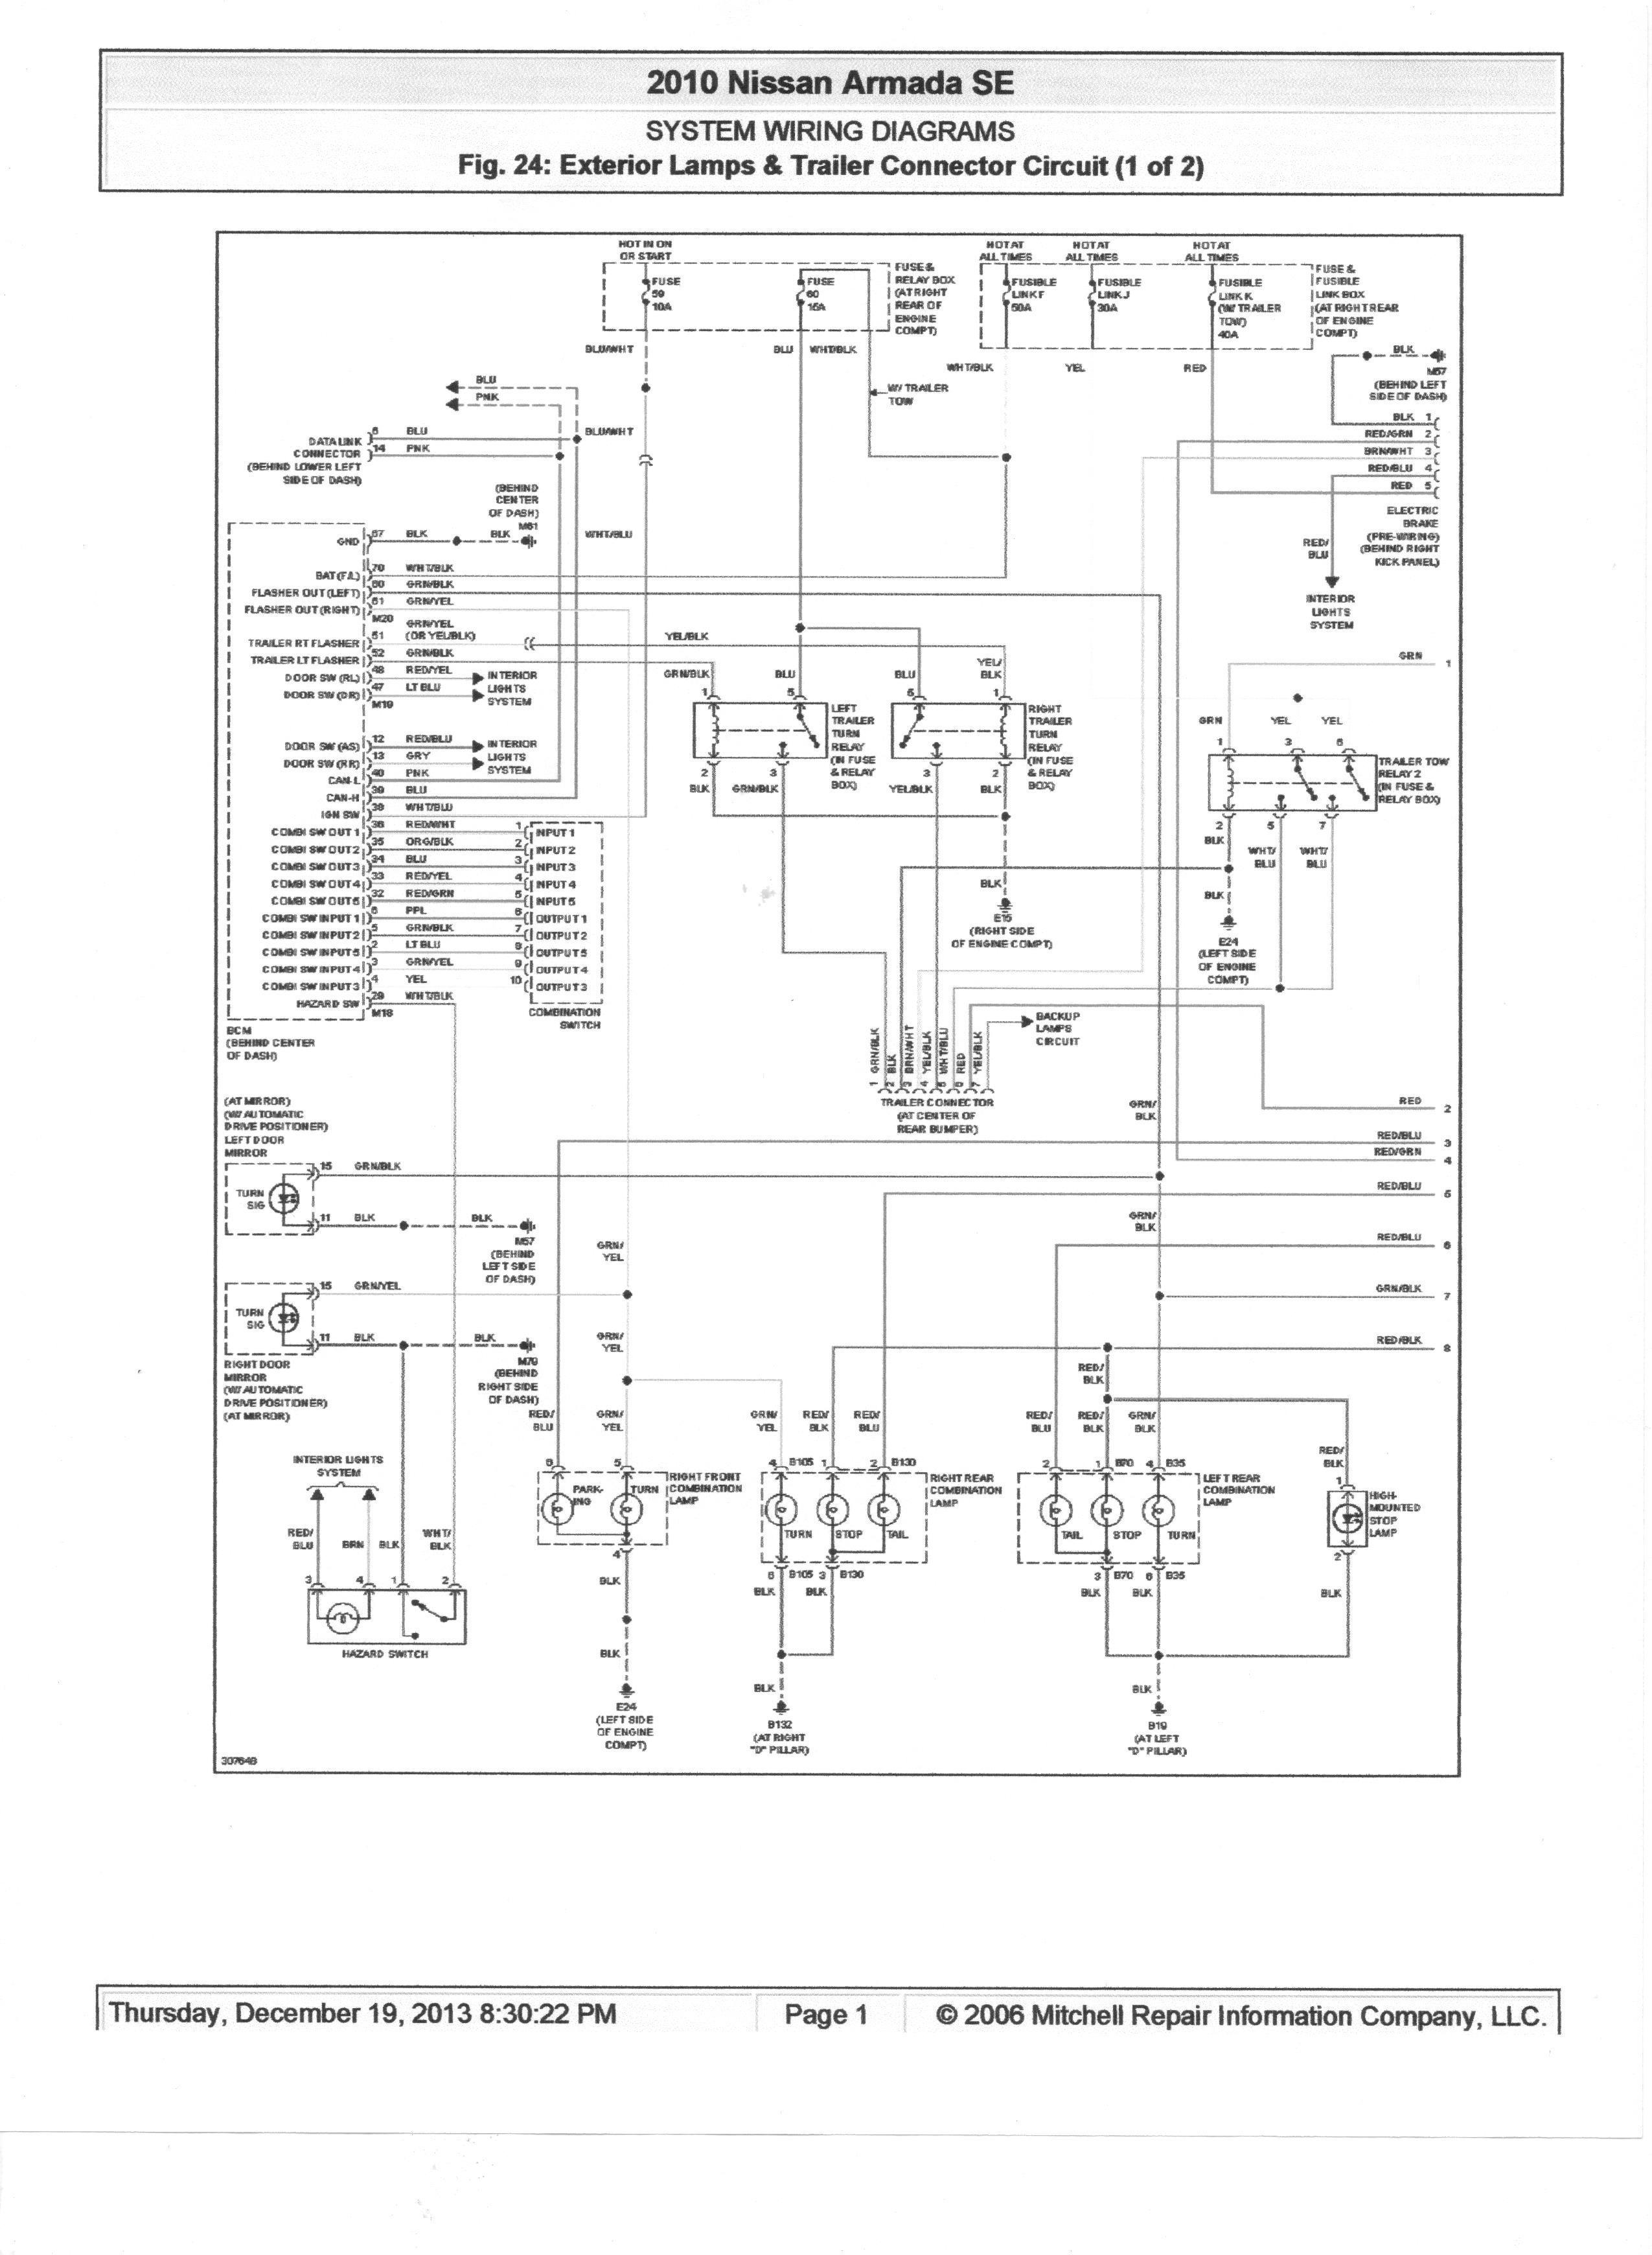 2006 Nissan Titan Parts Diagram 2011 Nissan Armada Dash Wiring Diagram Wire Center • Of 2006 Nissan Titan Parts Diagram